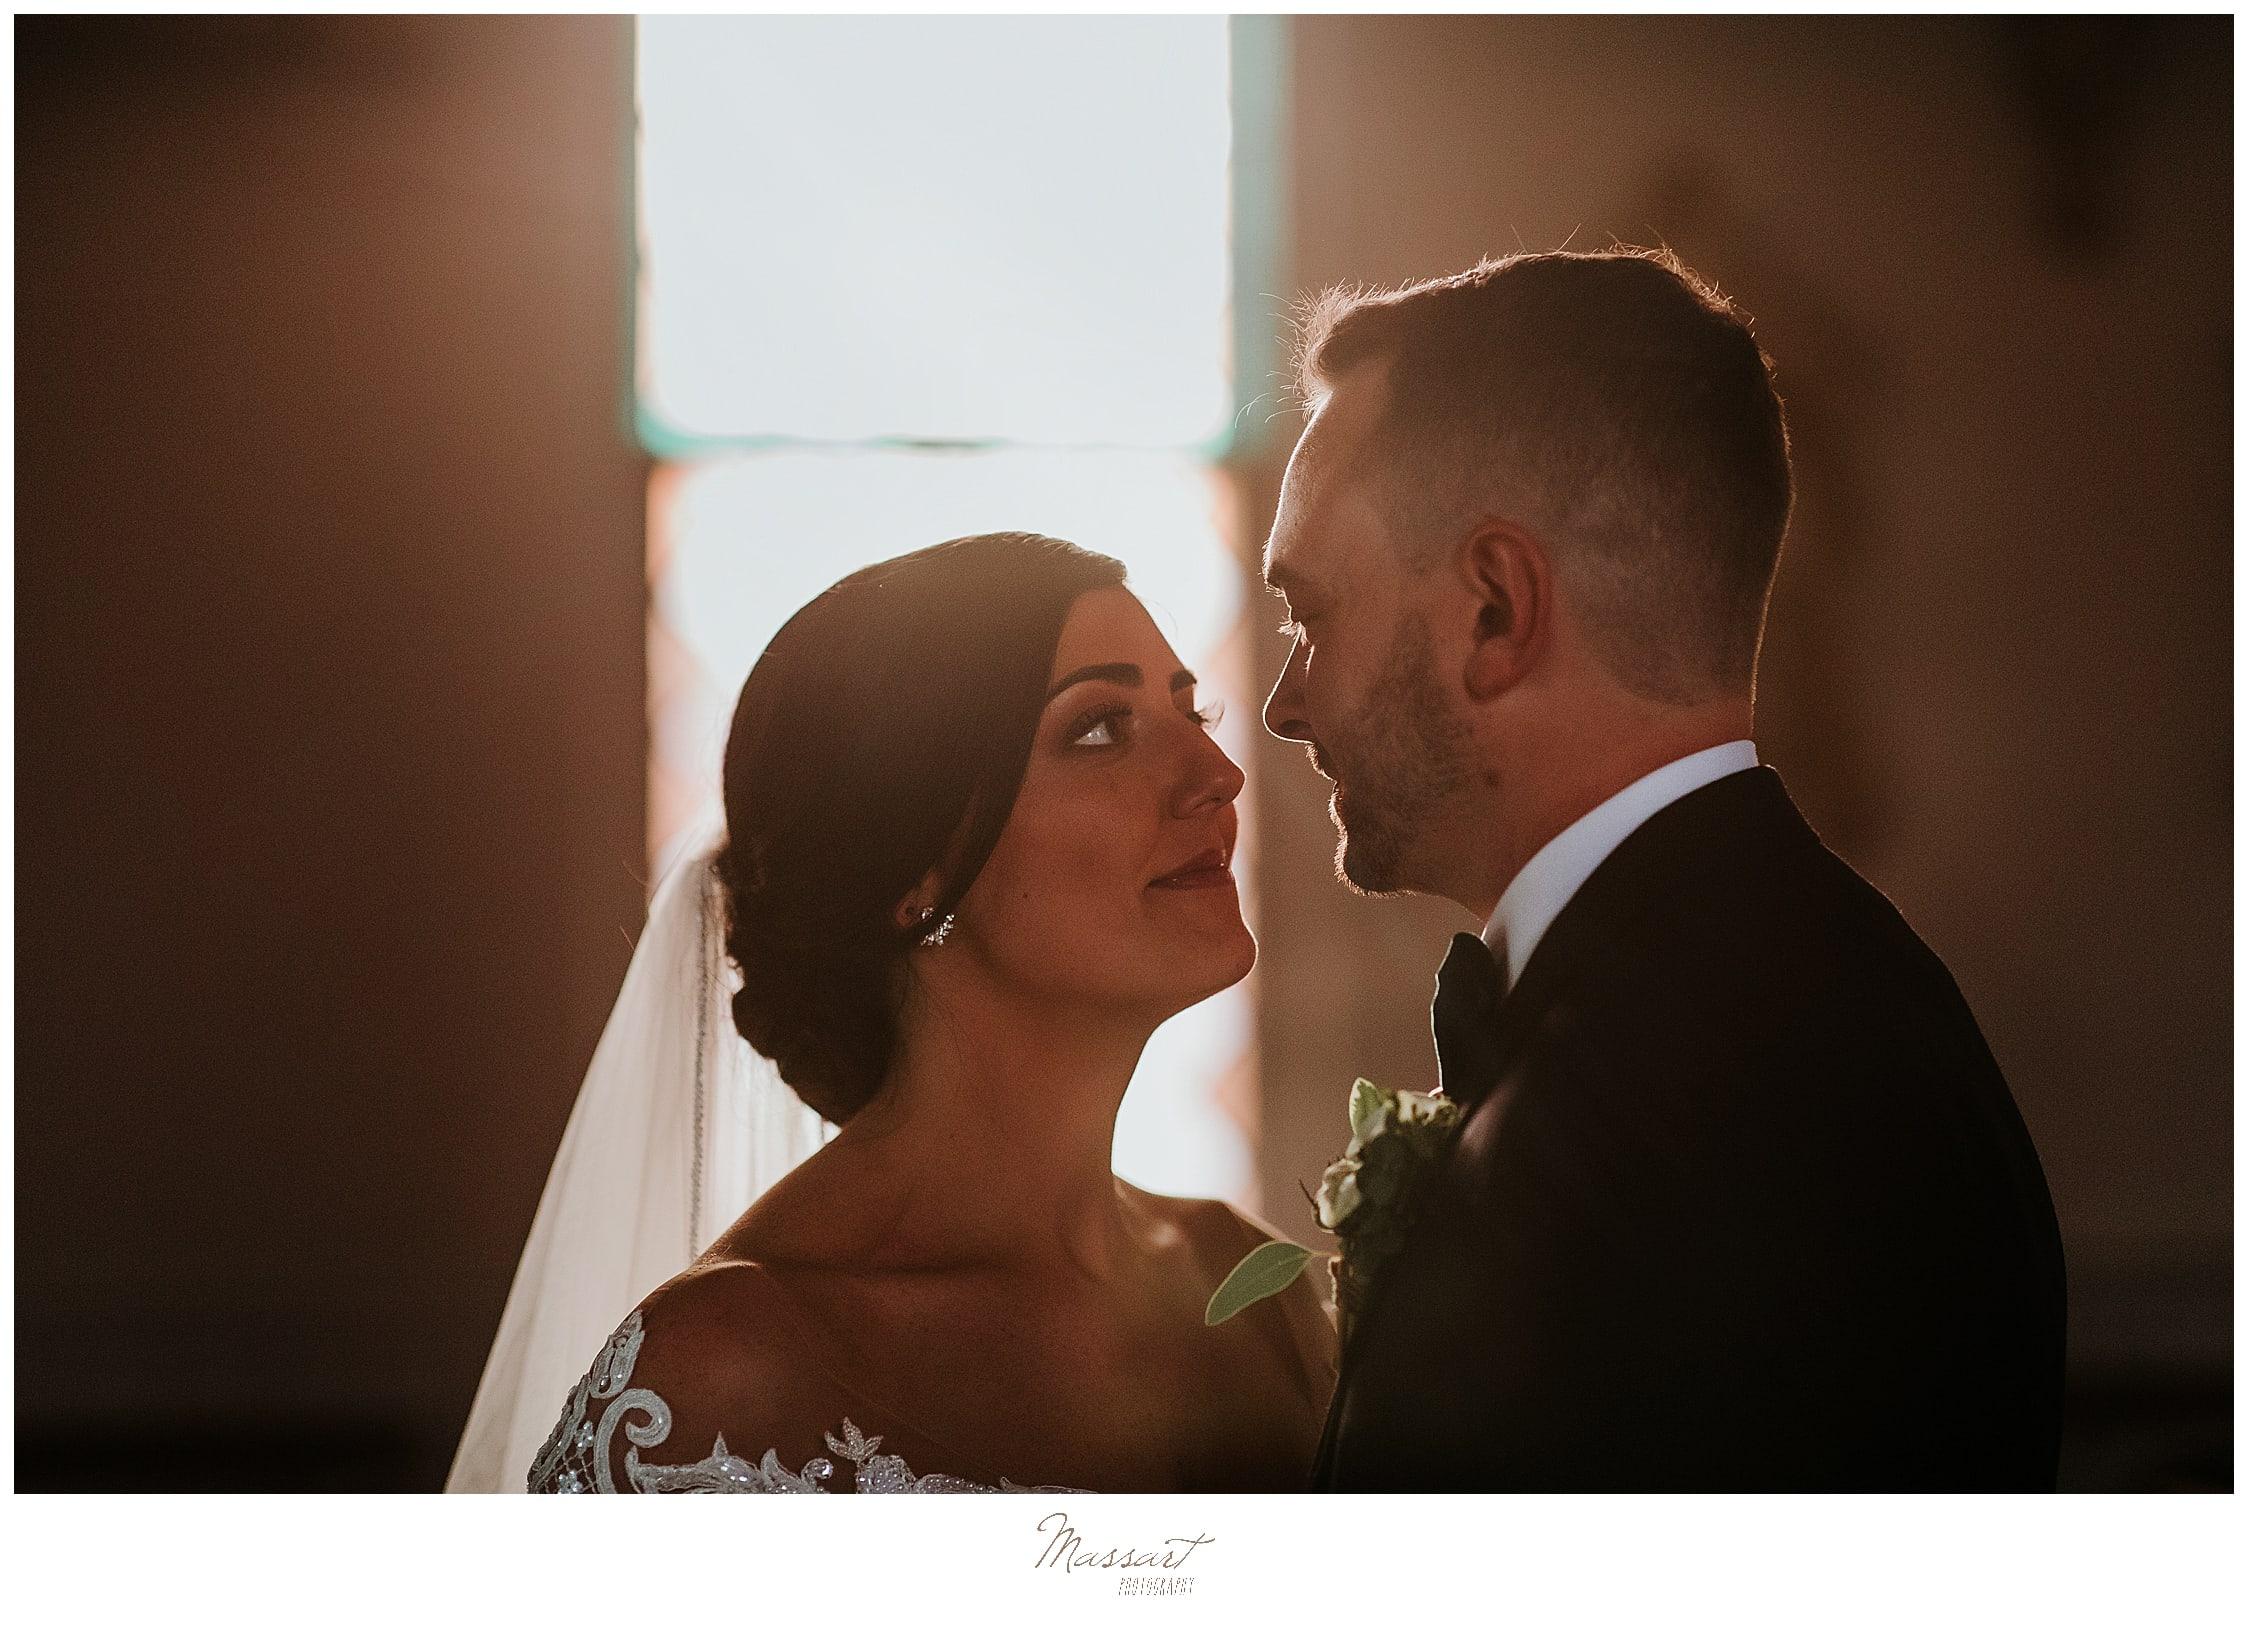 bride and groom pose for dramatic wedding portraits by Massachusetts wedding photographer Massart Photography